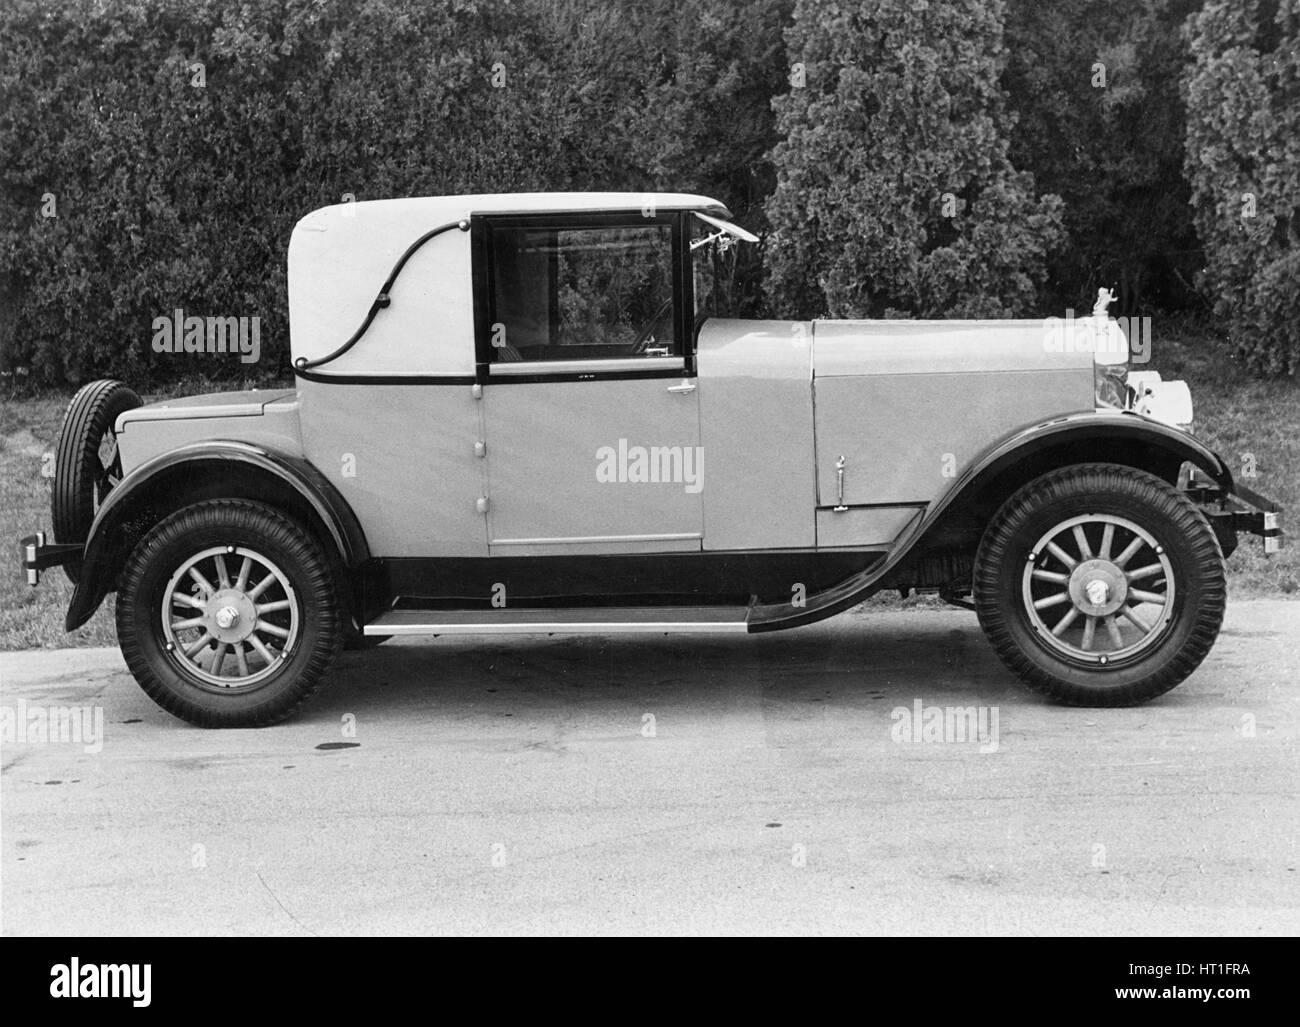 1926 Franklin series II - Stock Image